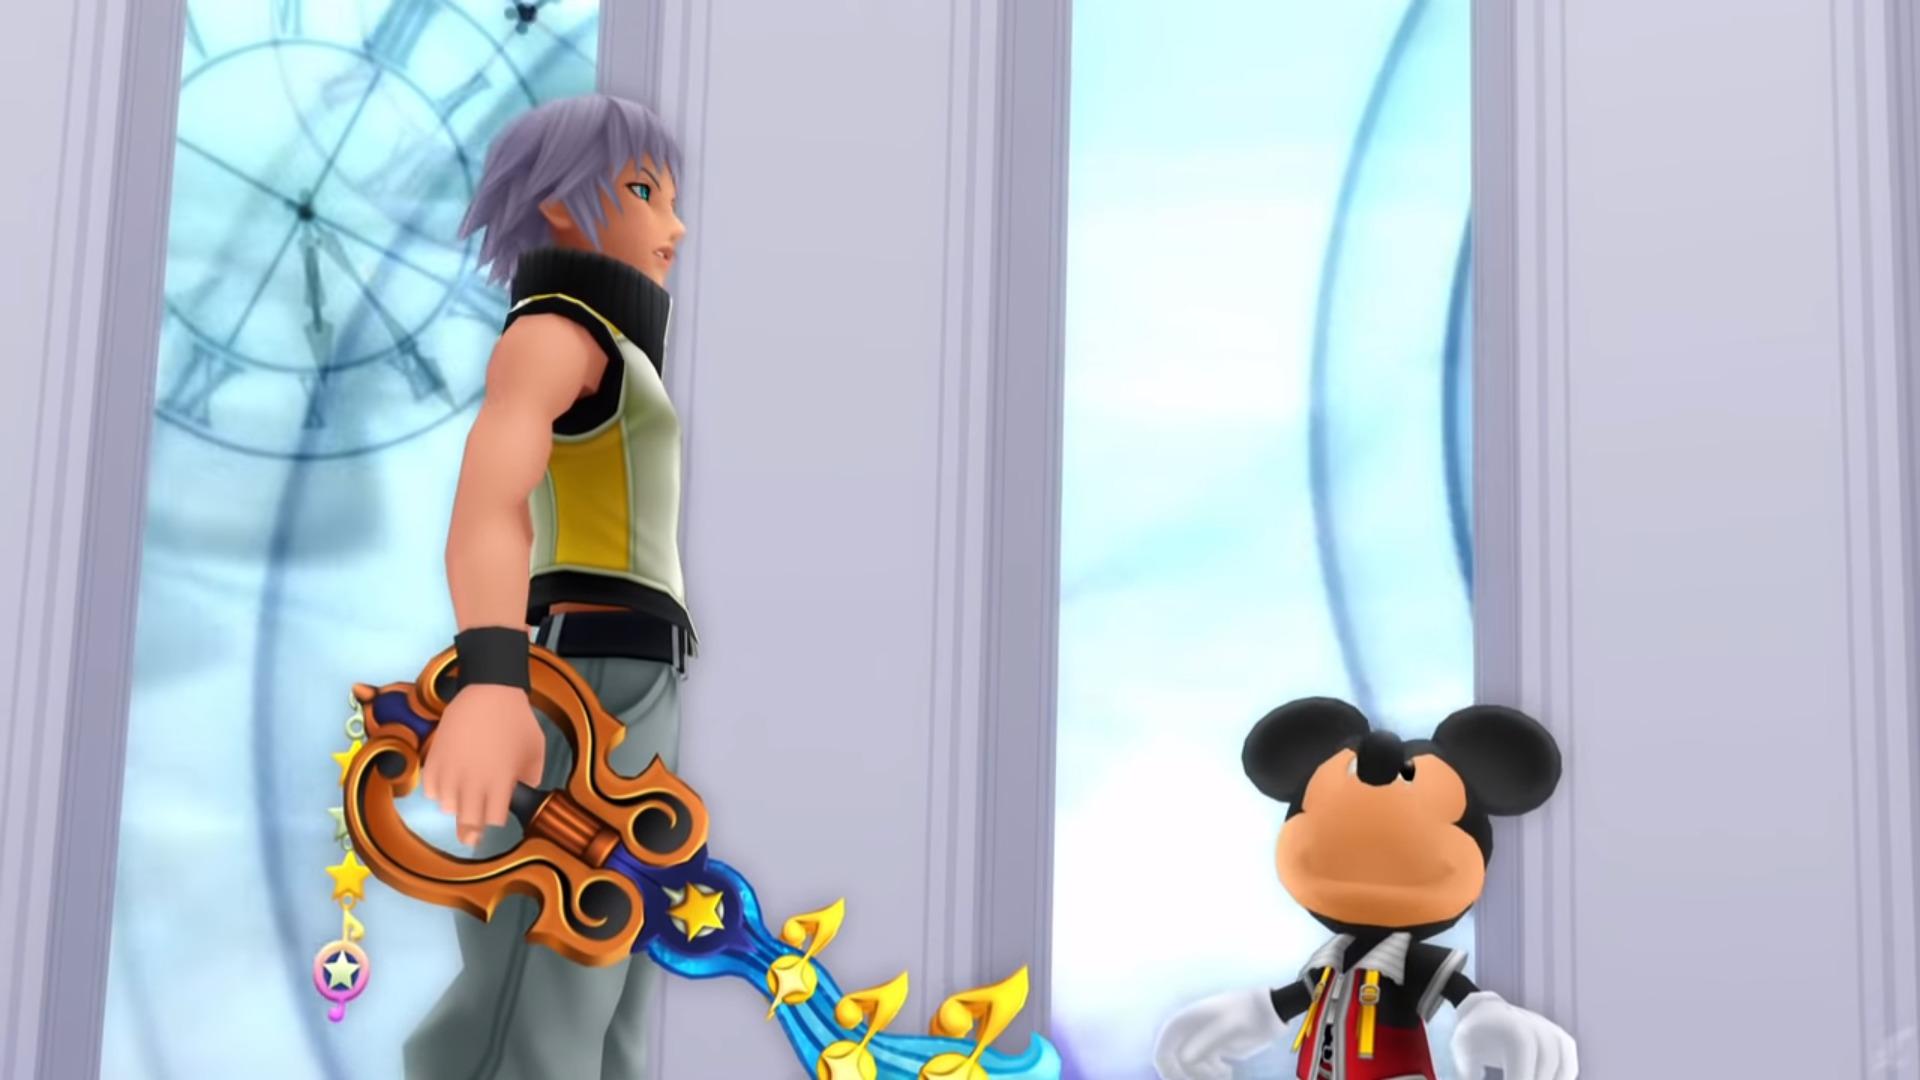 Riku et Mickey dans la salle du trône